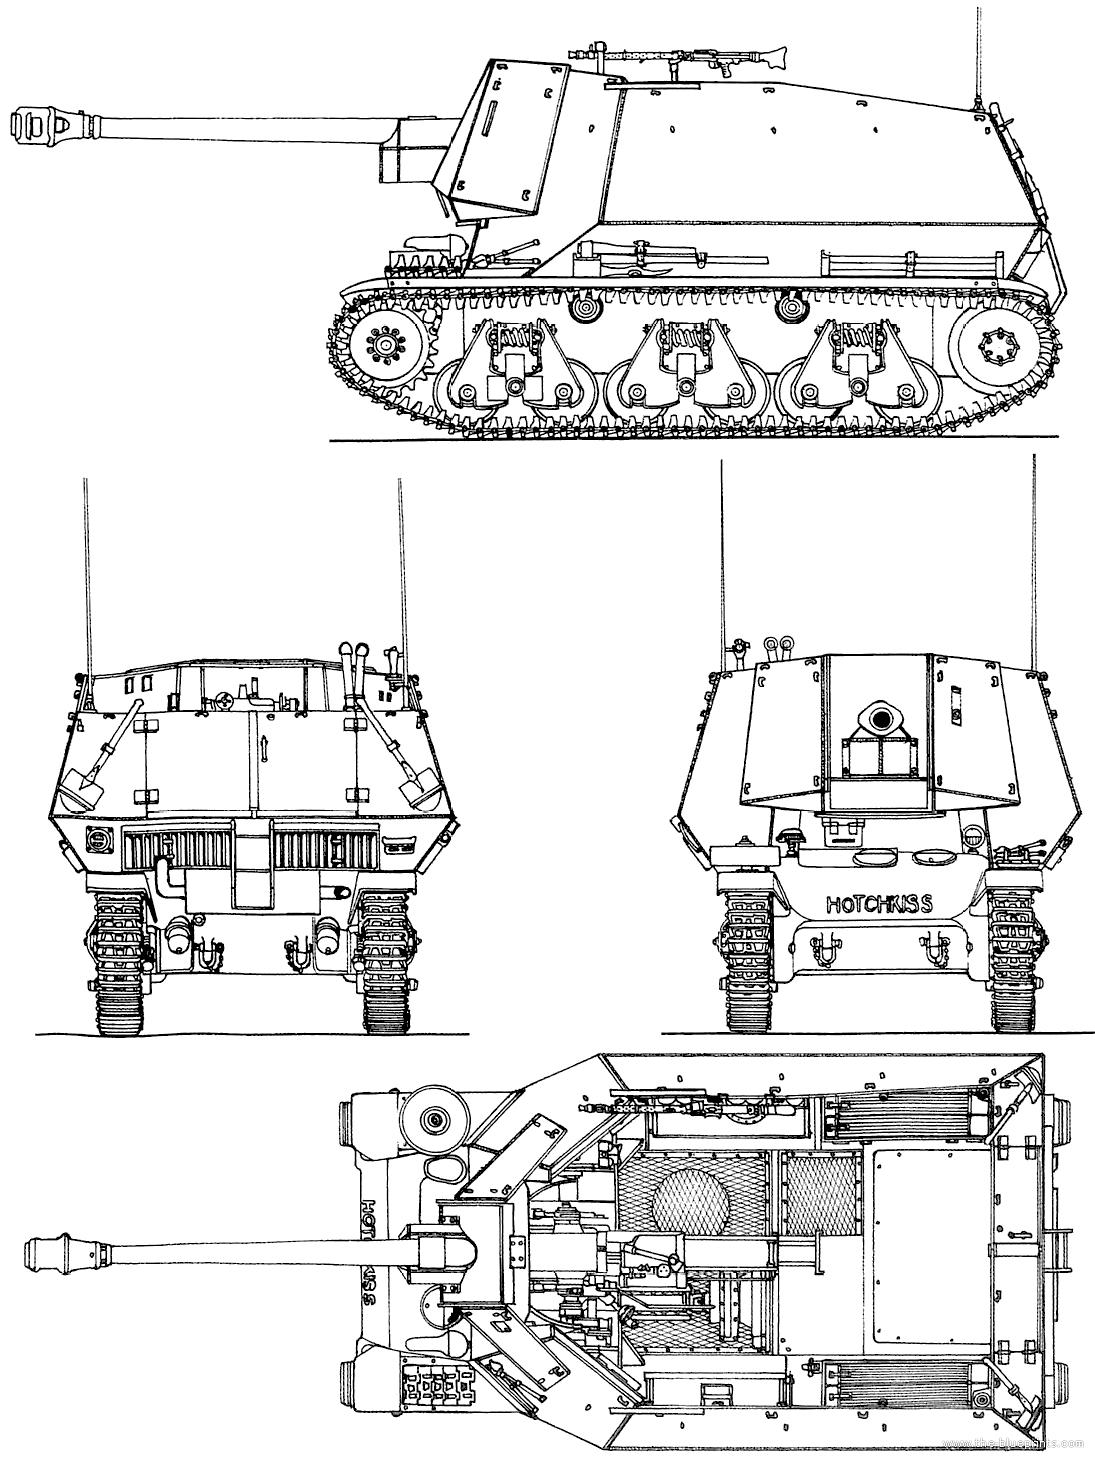 Blueprints Gt Tanks Gt Tanks 1 9 Gt 7 5cm Pak 40 Sf Auf Geschutzwagen 39 F